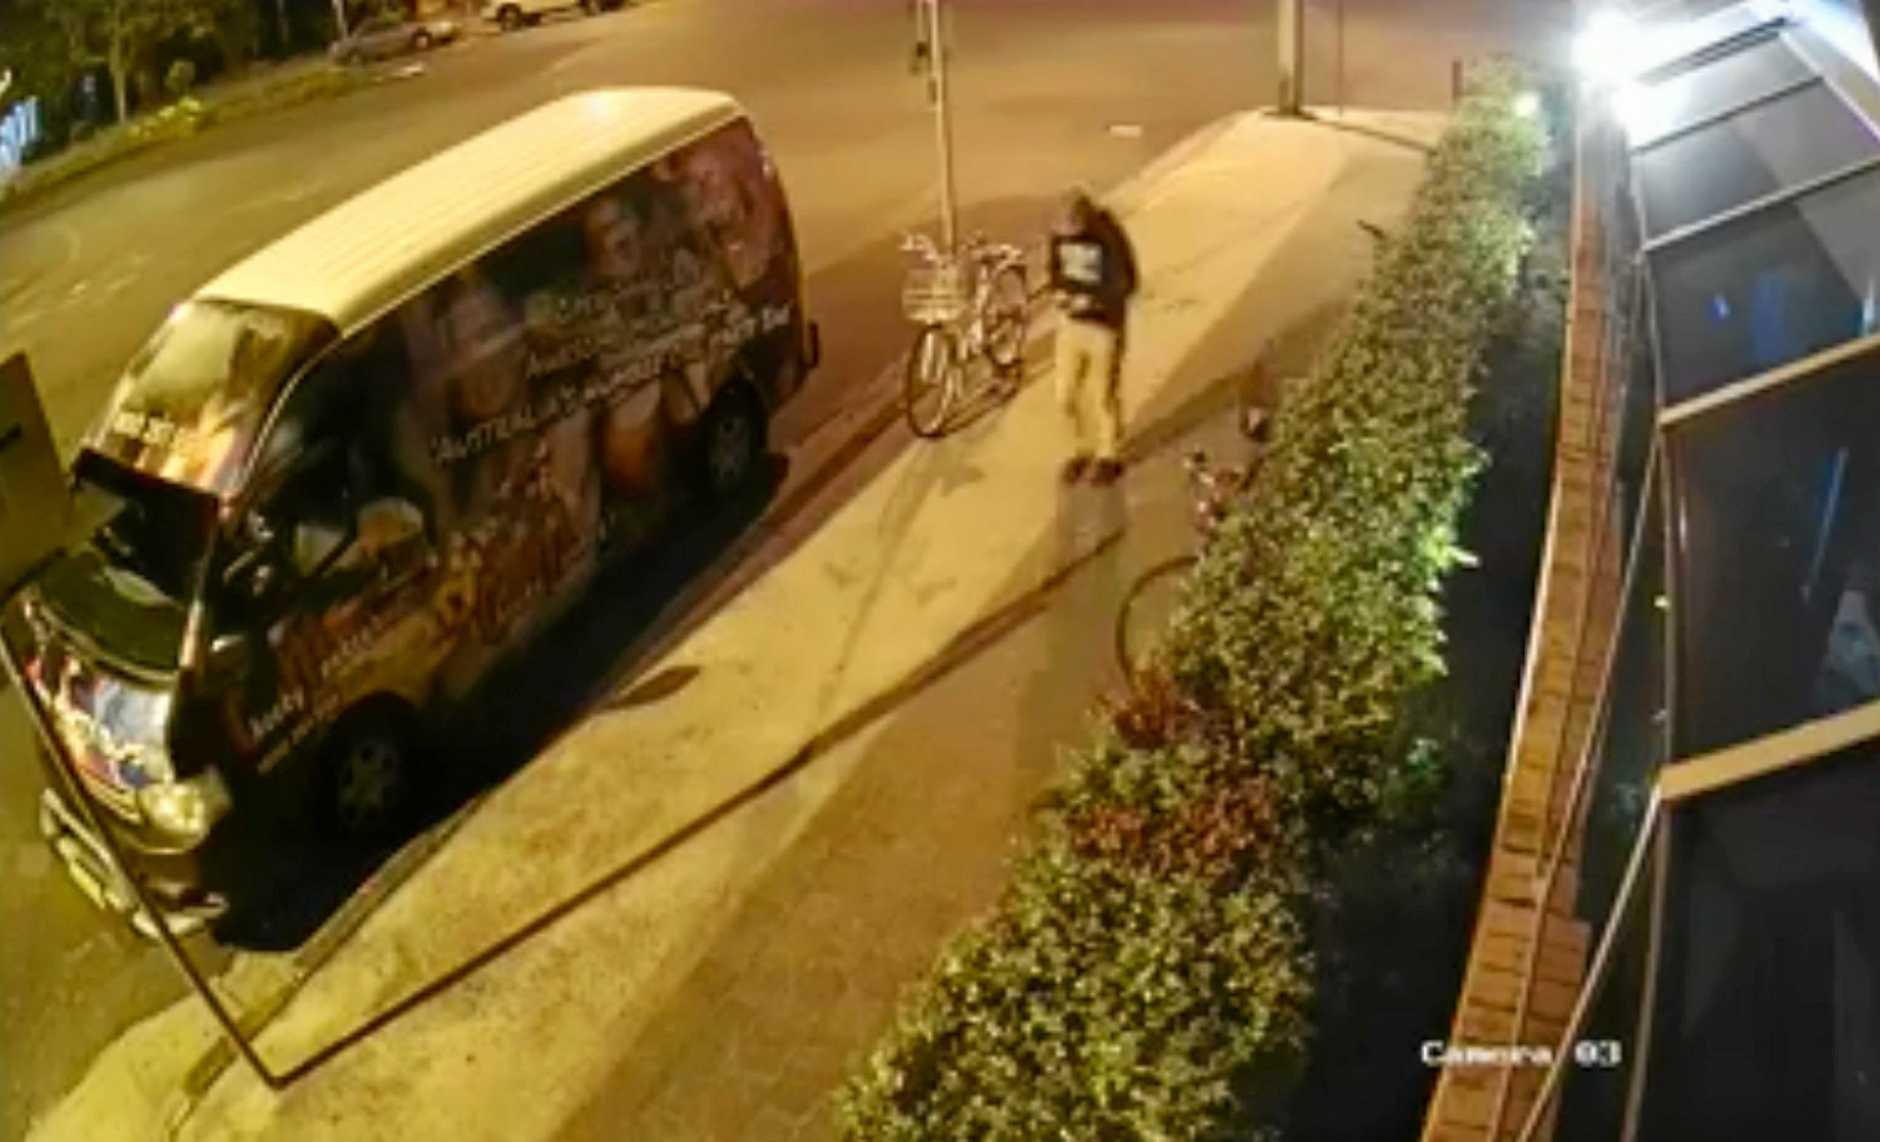 Last known siting of missing Belgian teen Theo Hayez outside Cheeky Monkeys in Byron Bay.